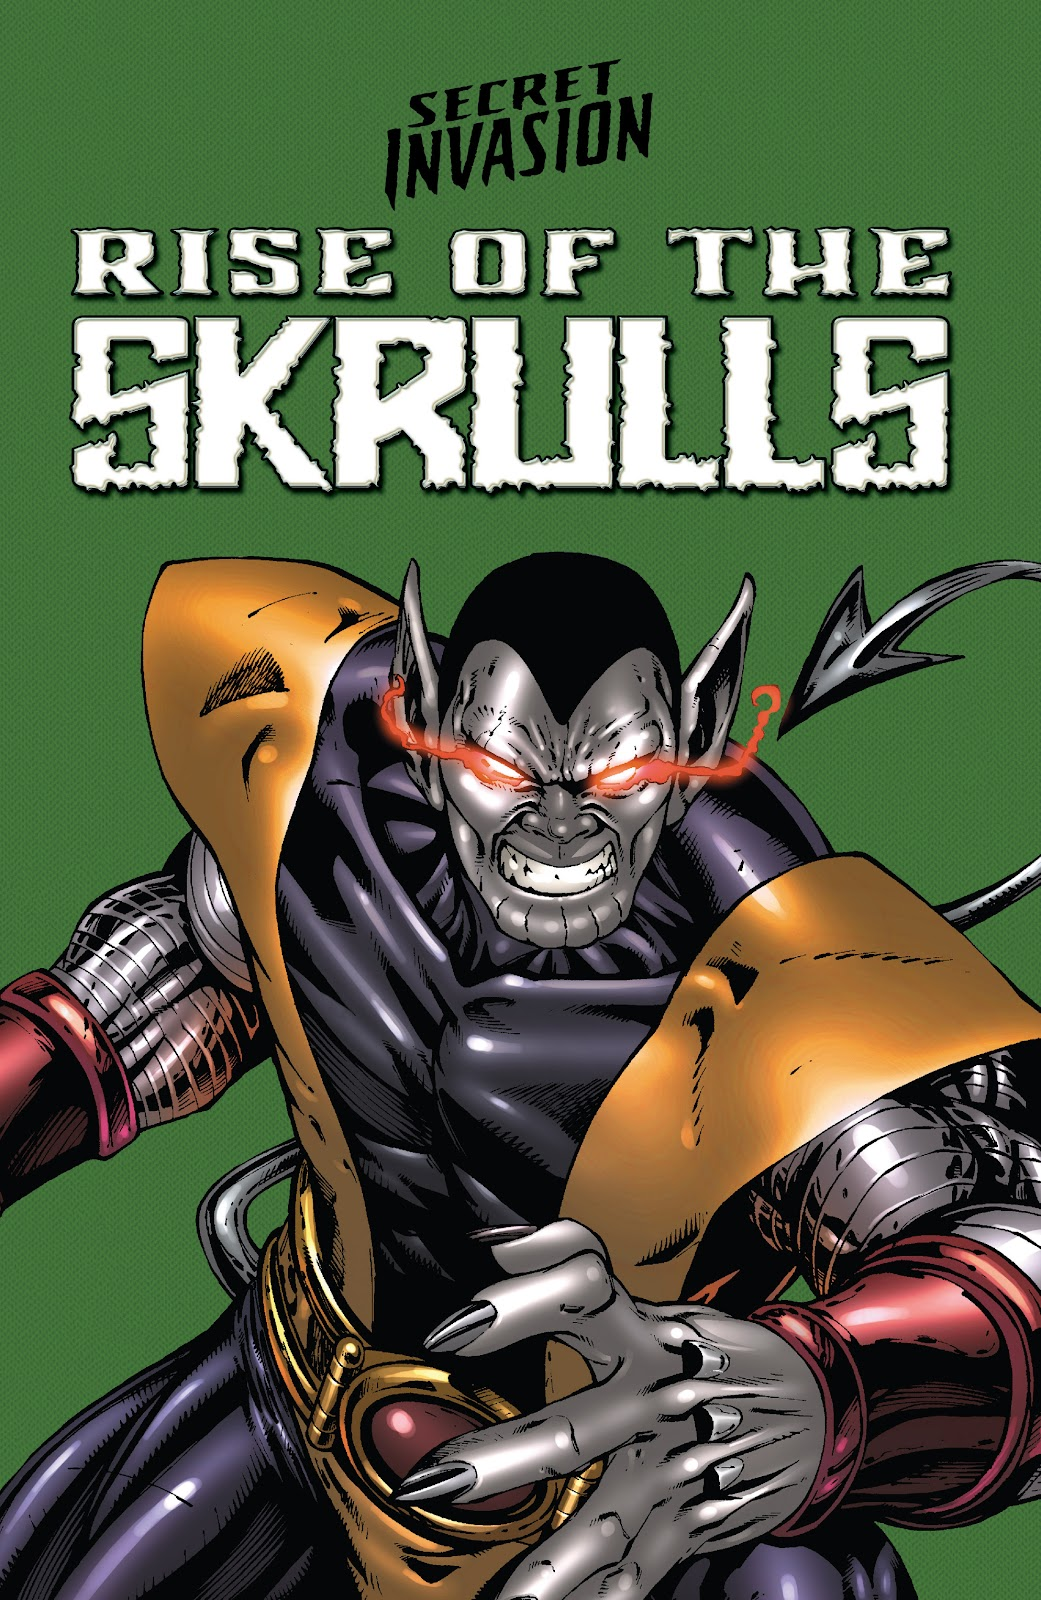 Read online Secret Invasion: Rise of the Skrulls comic -  Issue # TPB (Part 1) - 2